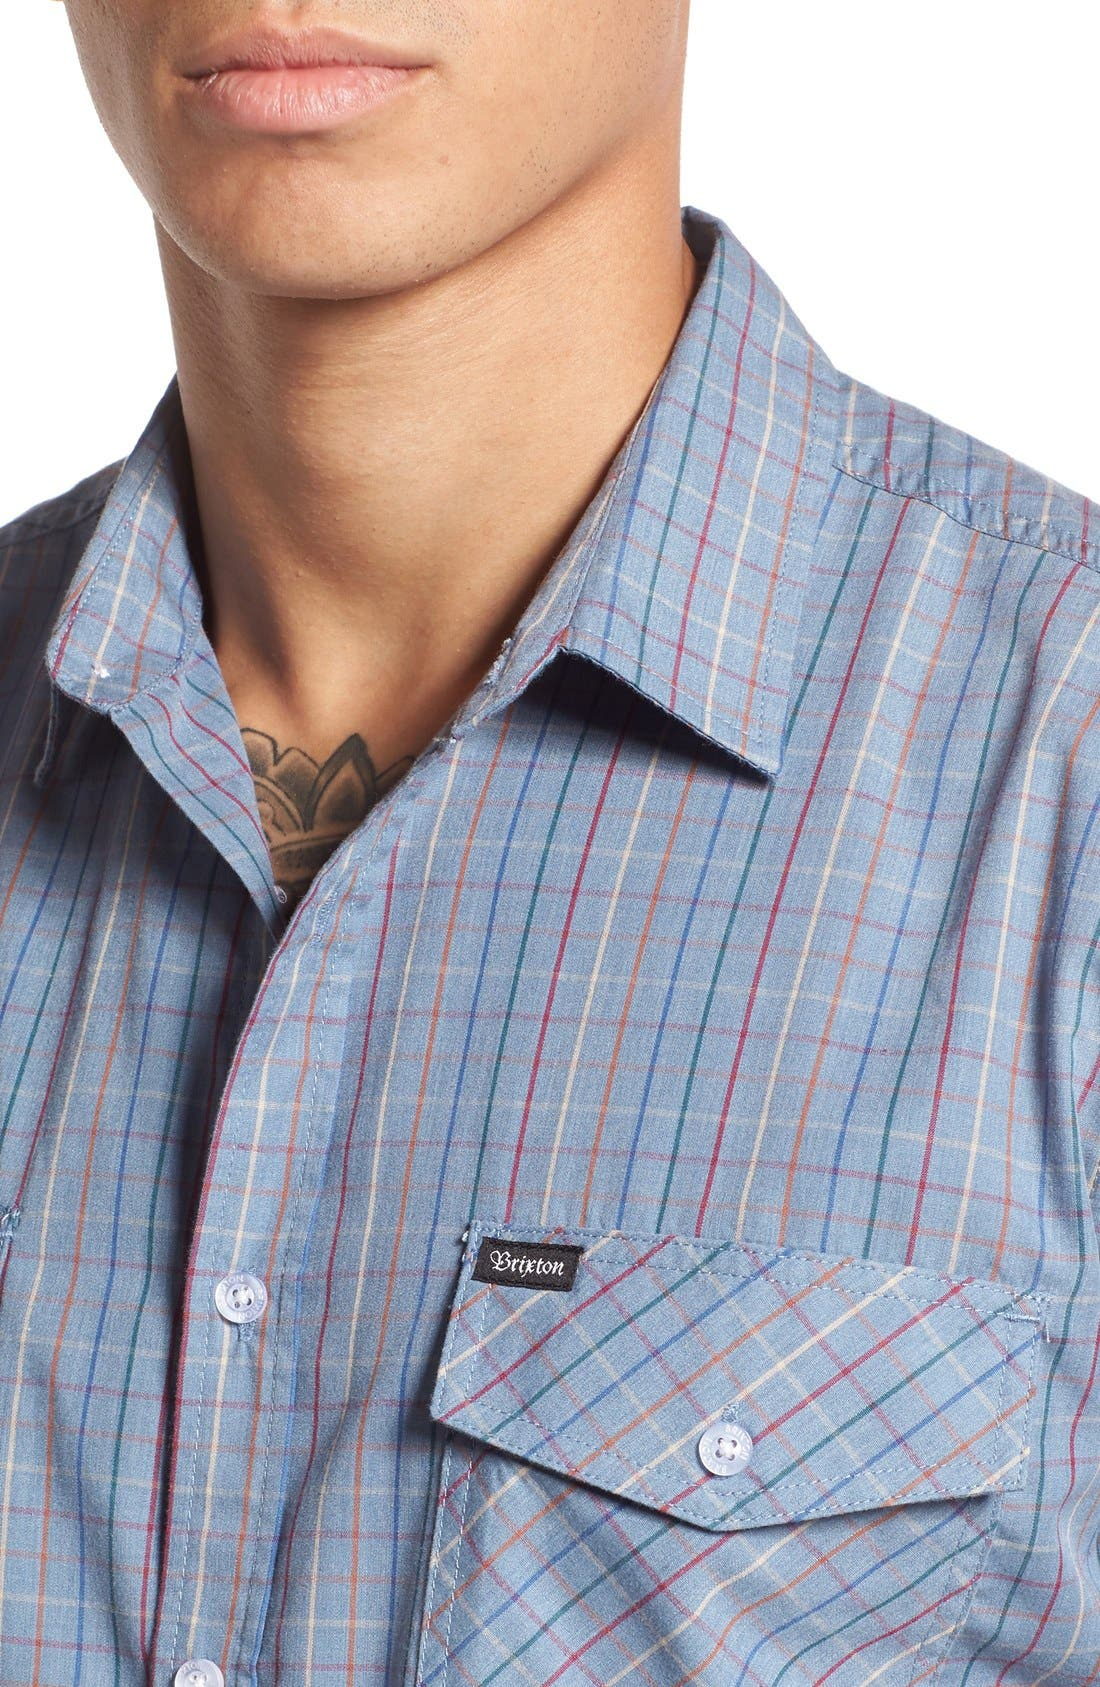 'Memphis' Trim Fit Plaid Short Sleeve Woven Shirt,                             Alternate thumbnail 4, color,                             Washed Blue